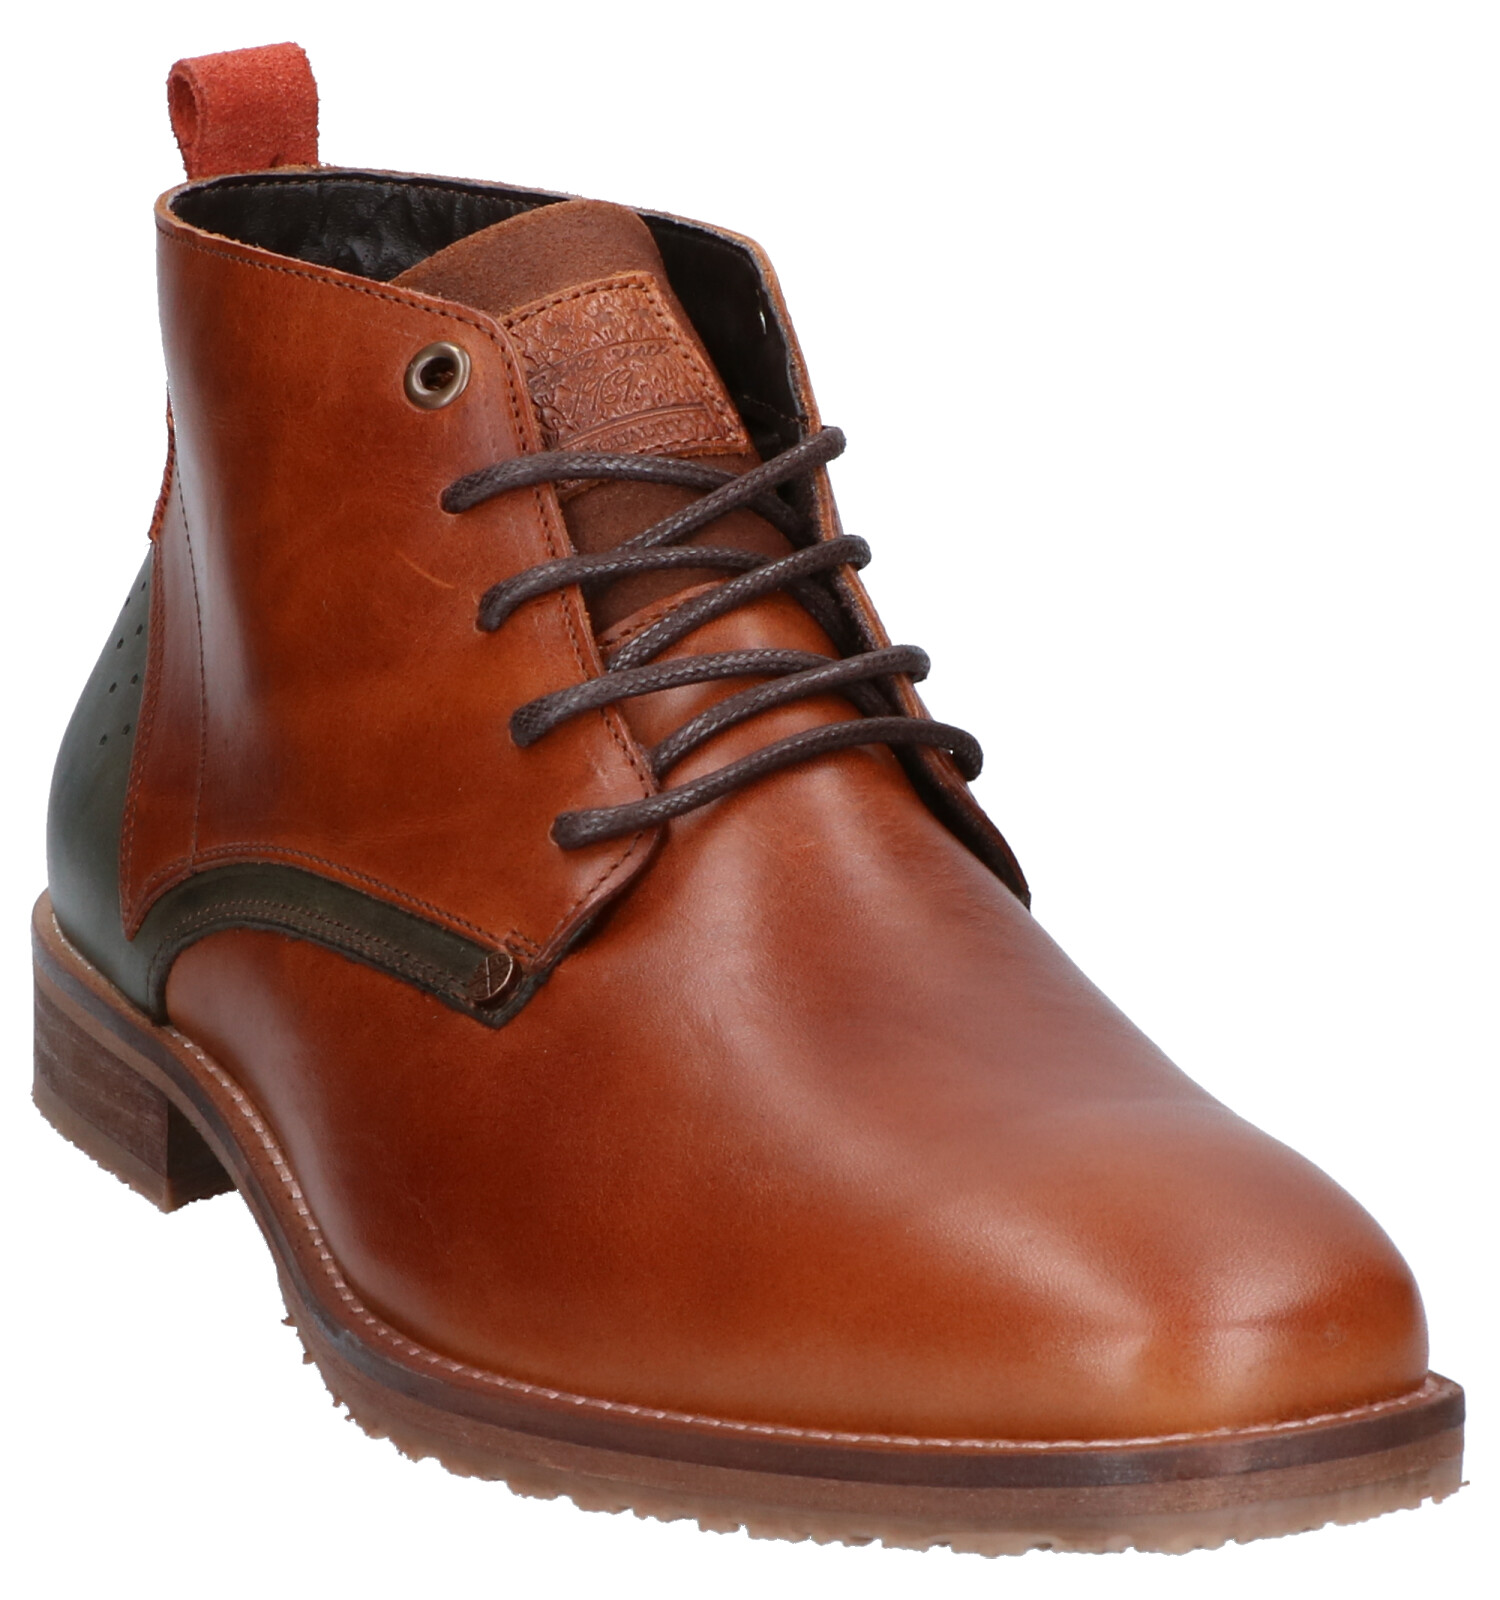 Cognac Bullboxer Cognac Cognac Boots Cognac Cognac Bullboxer Bullboxer Boots Boots Boots Bullboxer Boots Bullboxer wZuiOPkXT